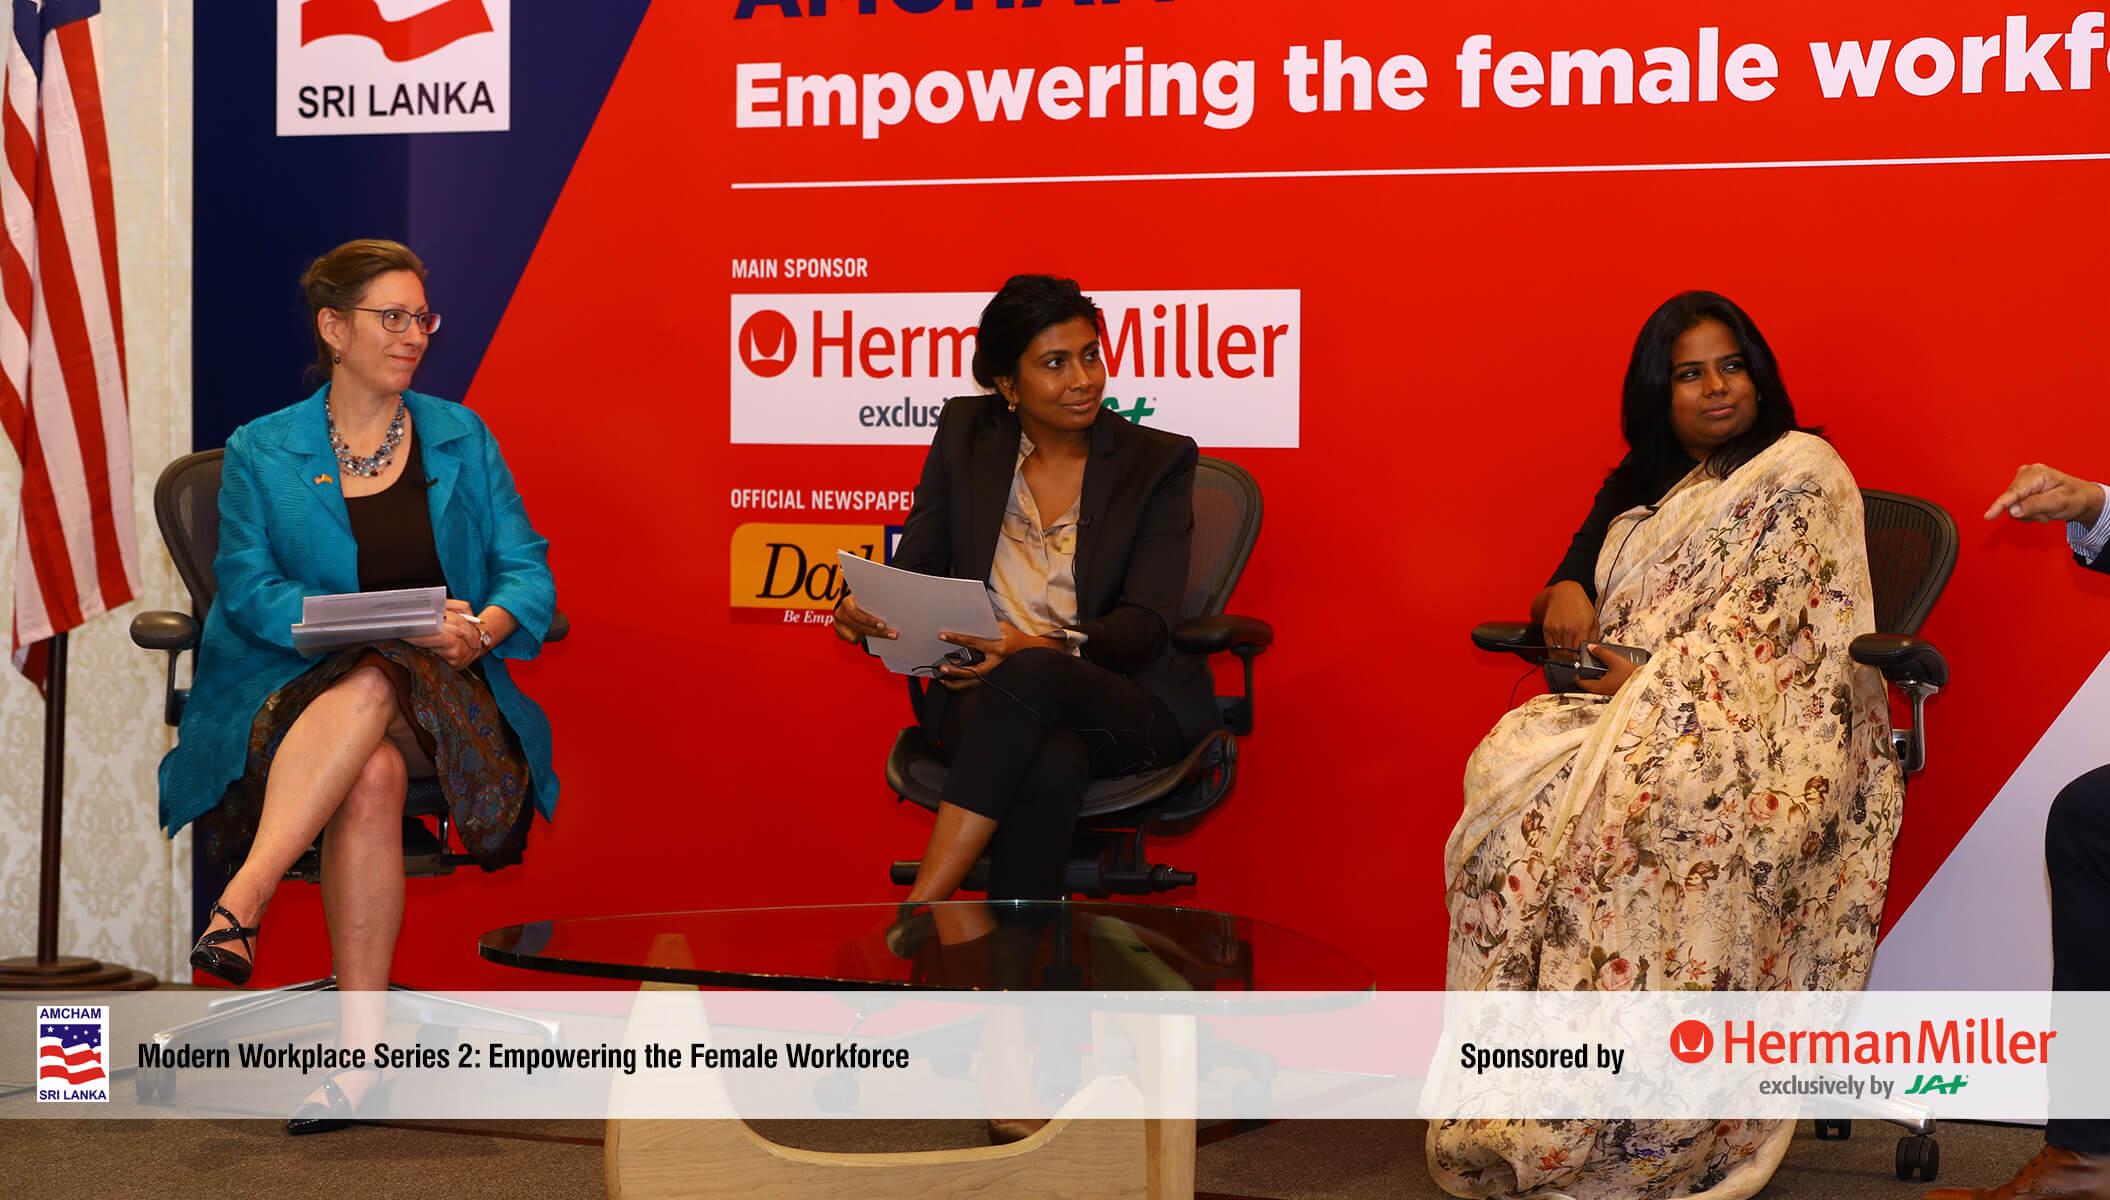 Modern Workplace Series 2: empowering the female workforce